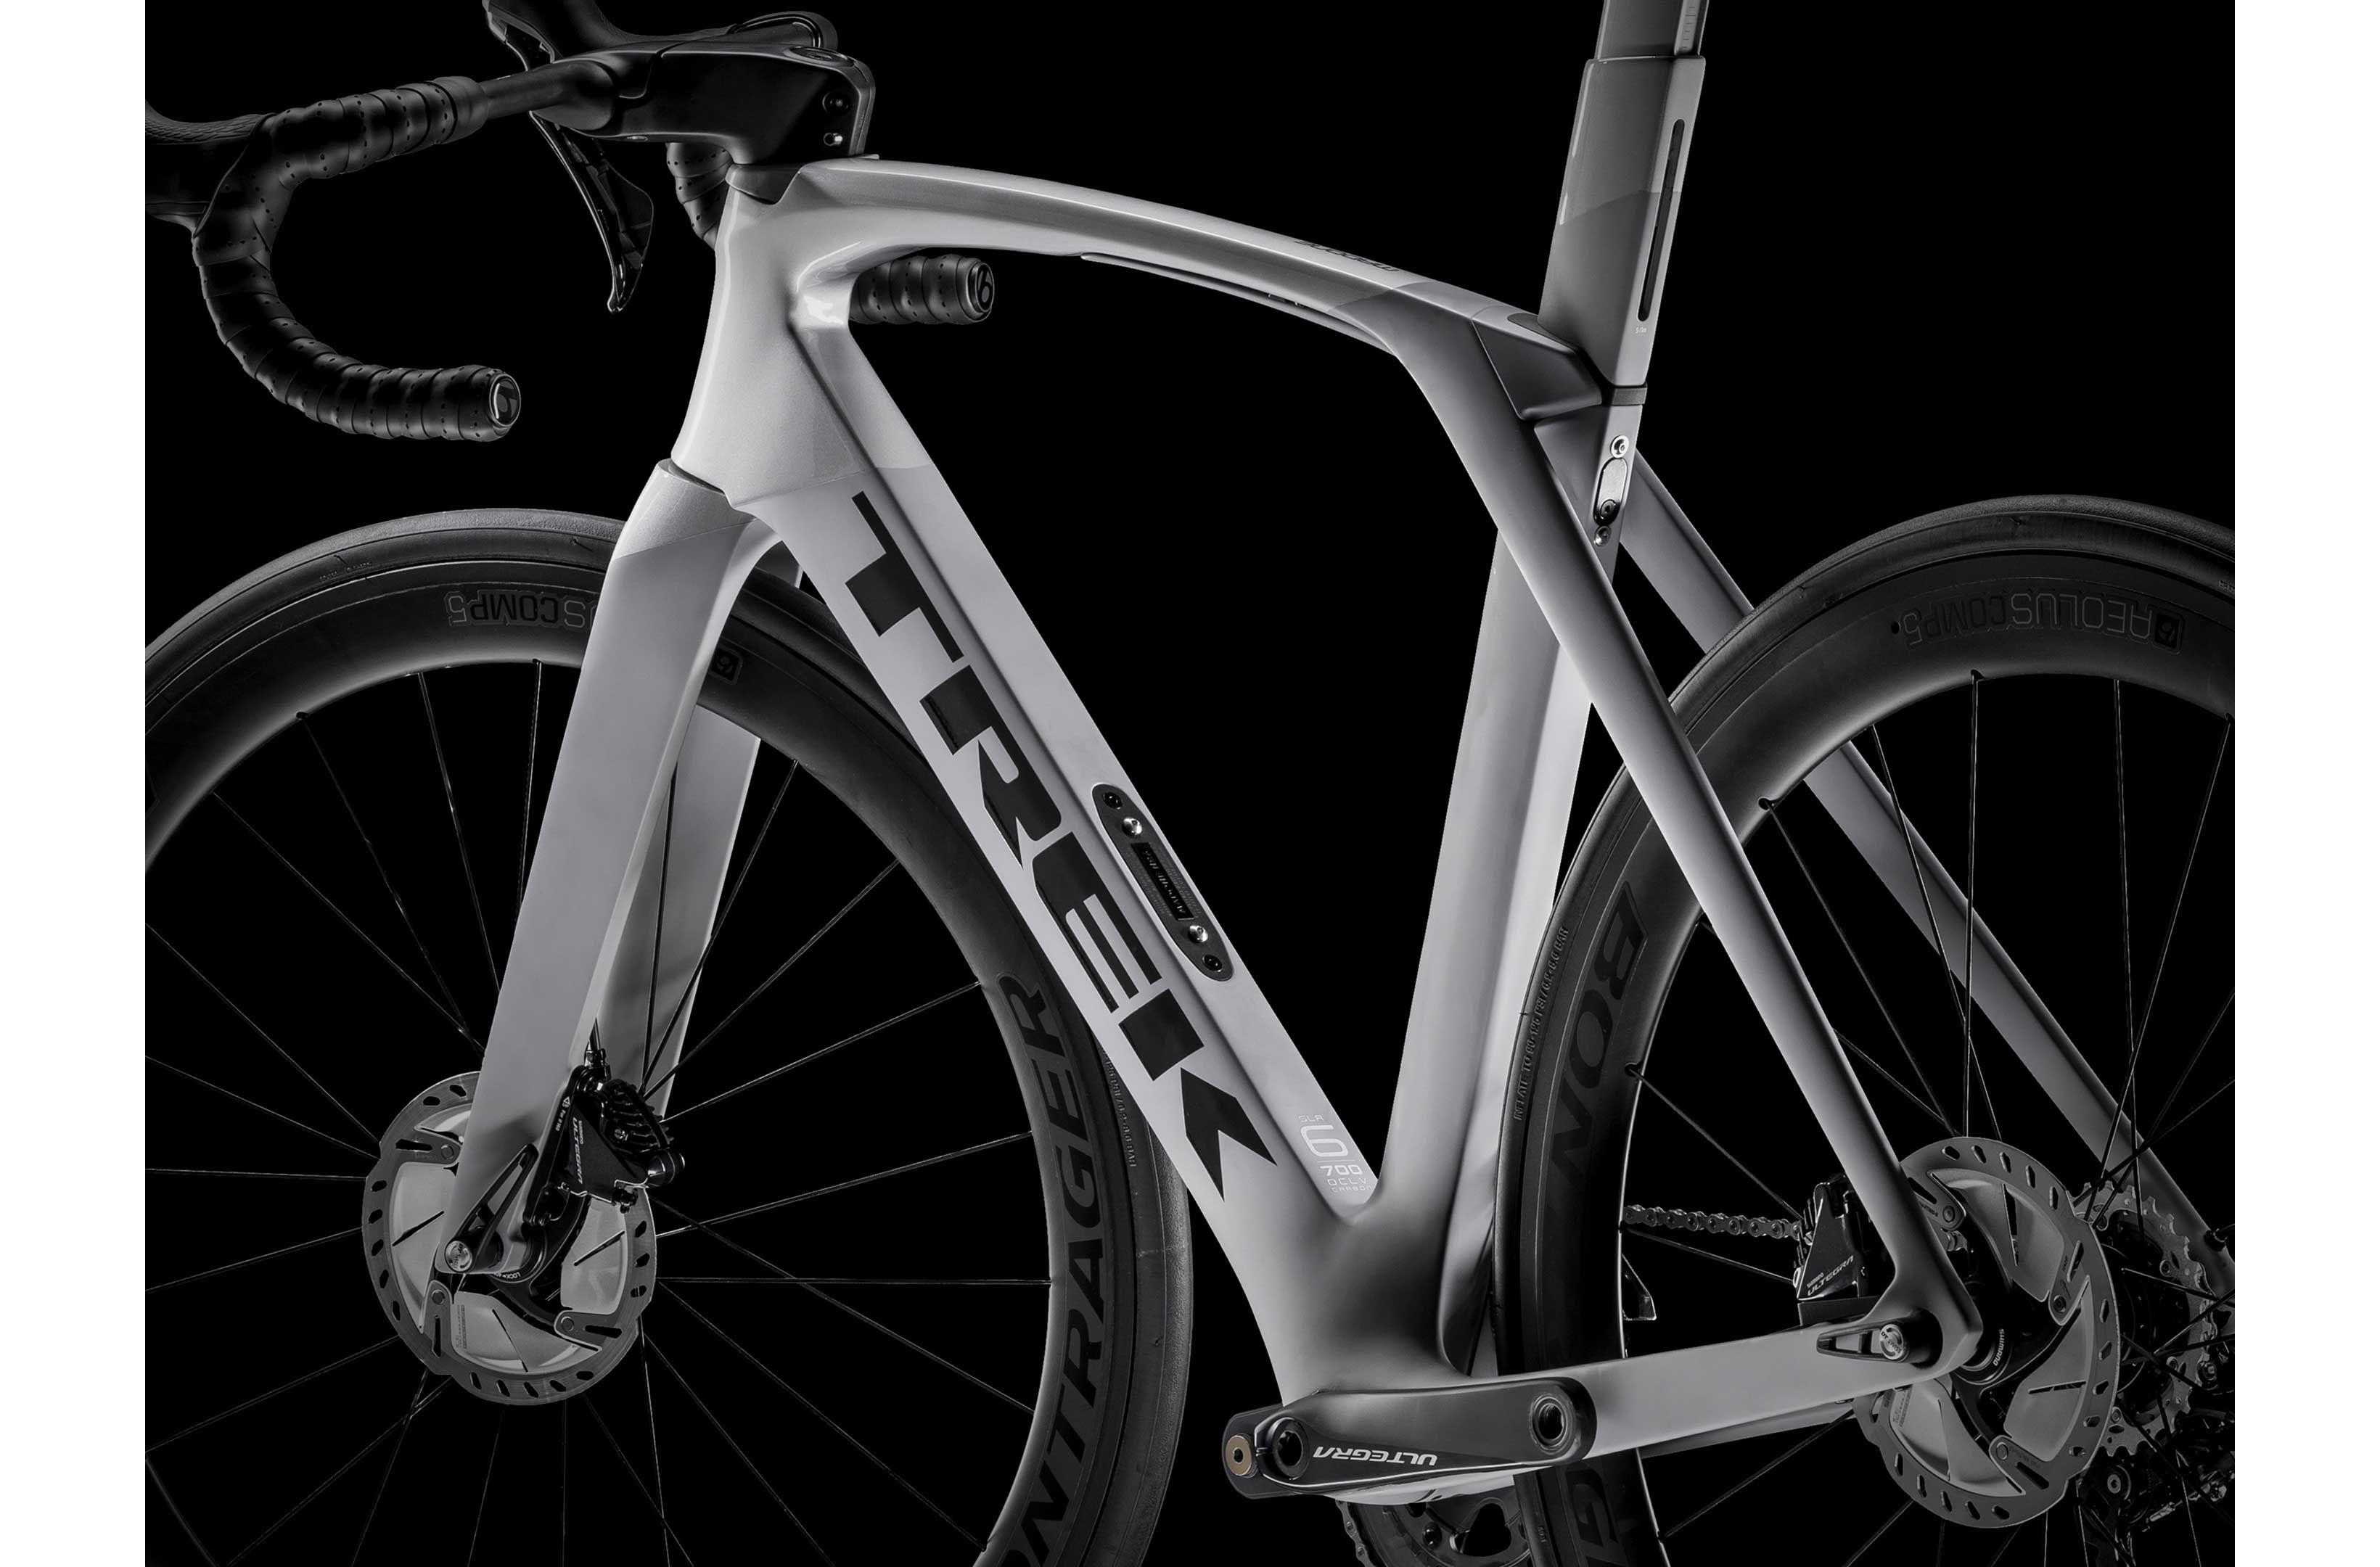 Trek Madone Slr 6 Disc 2019 Road Bike Road Bikes Evans Cycles Trek Madone Road Bikes Cool Bicycles